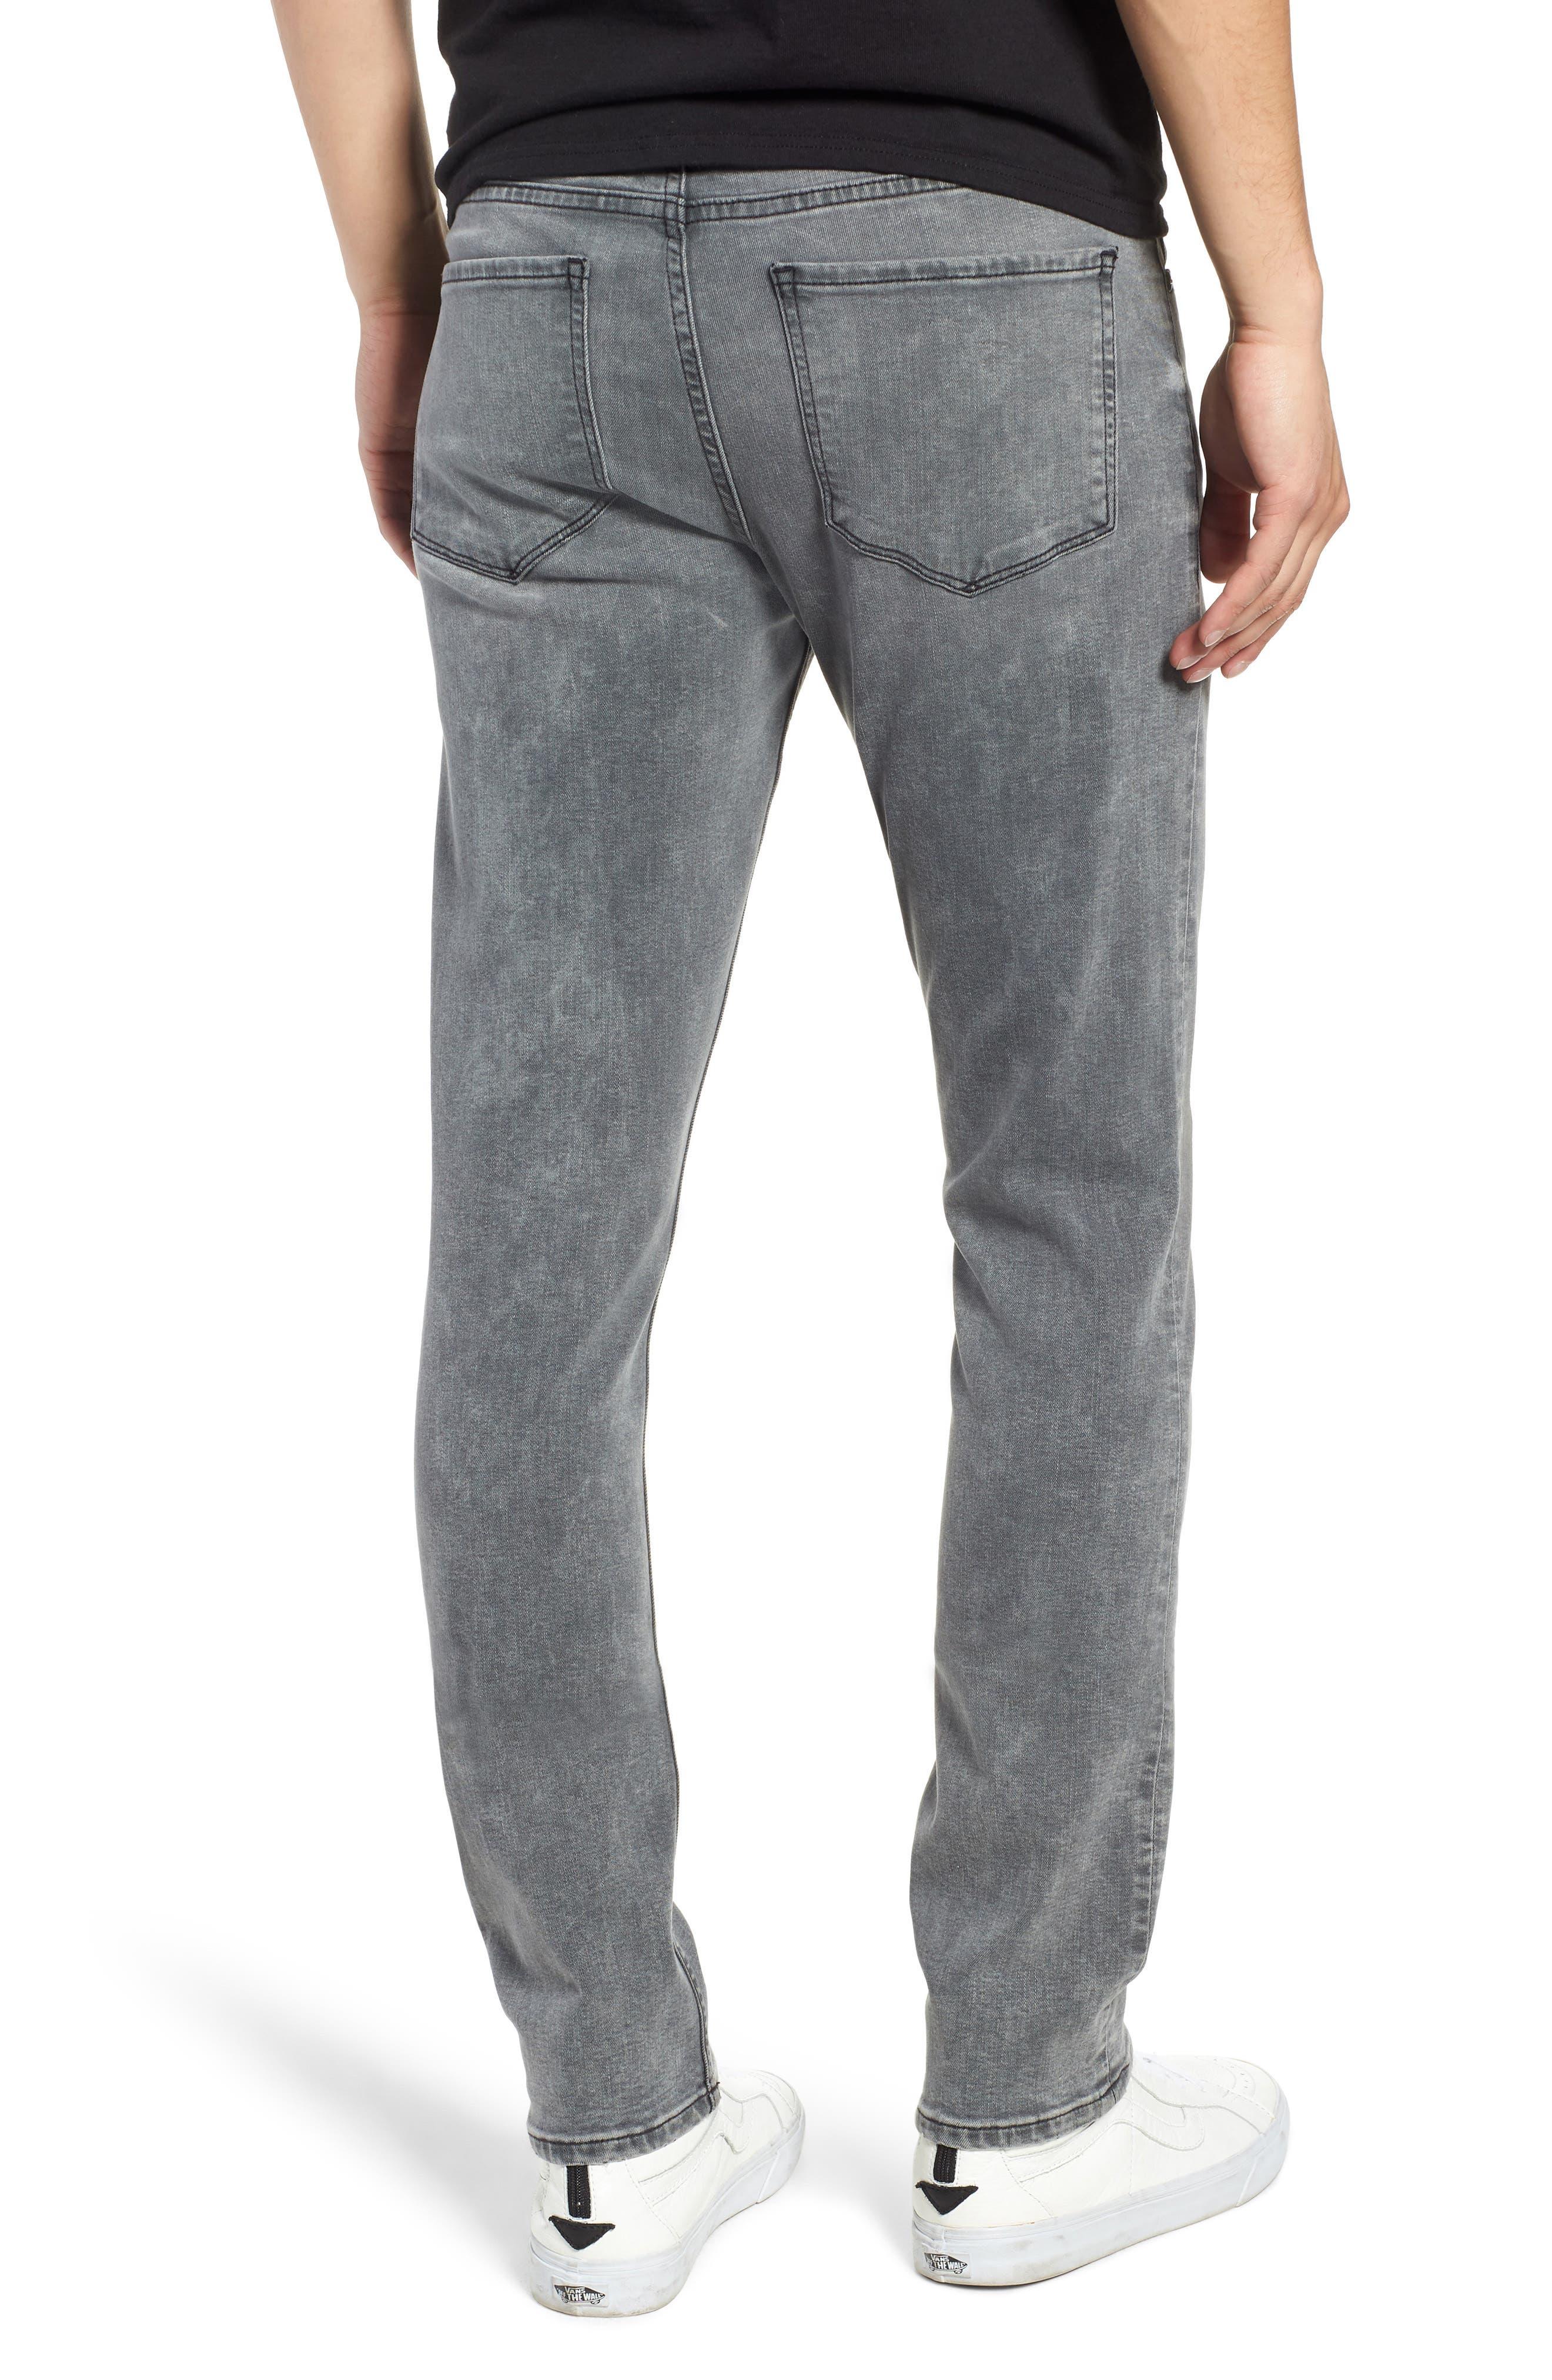 Lennox Slim Fit Jeans,                             Alternate thumbnail 2, color,                             020